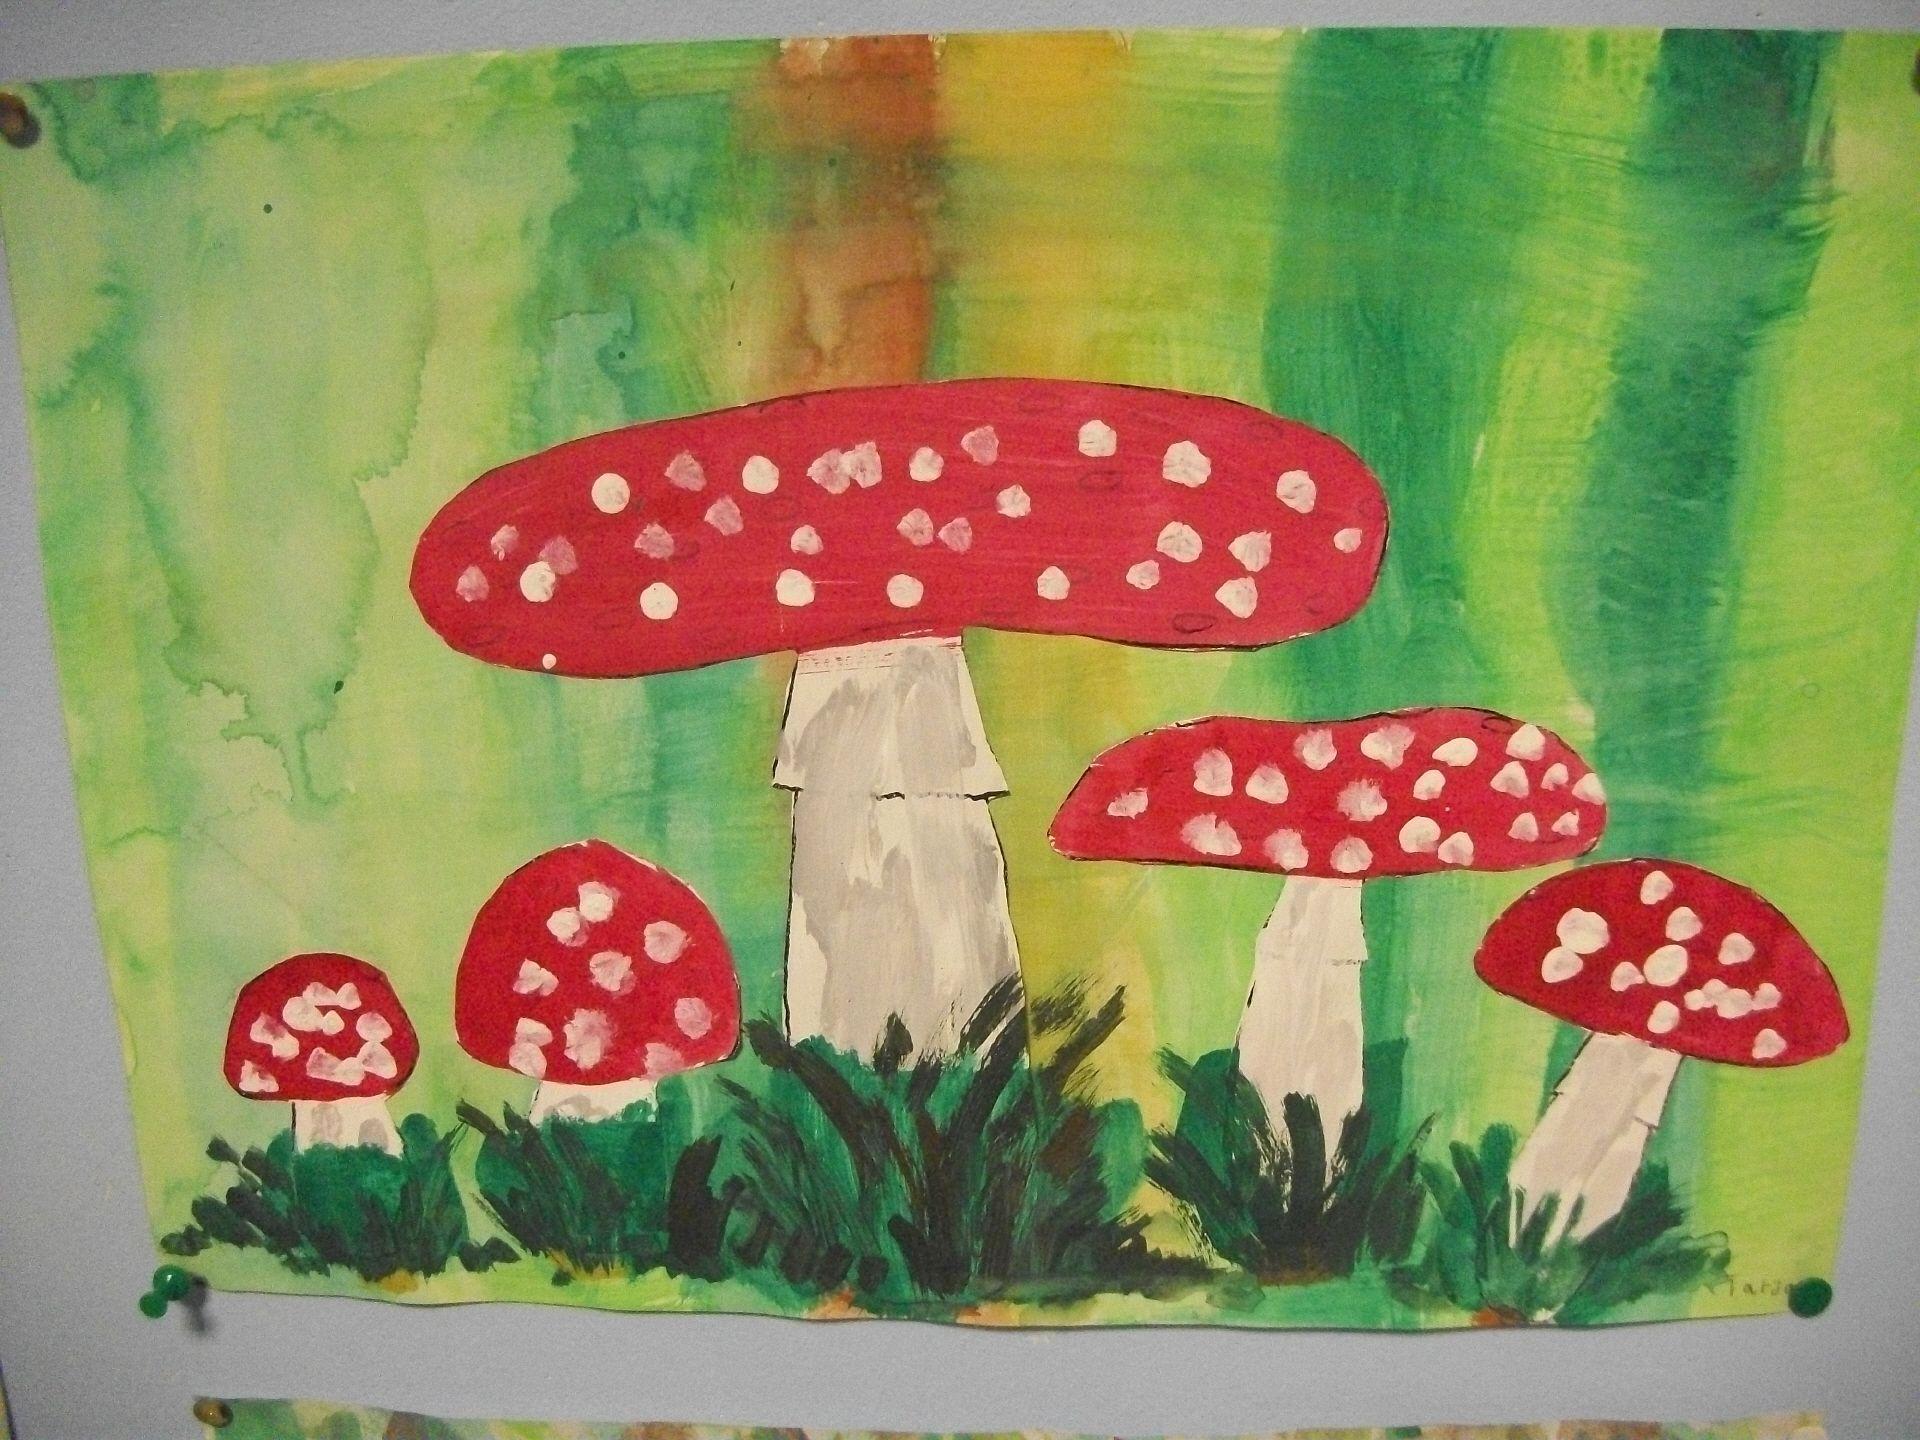 grundschule kunst 1. klasse - Google-Suche | School art ...